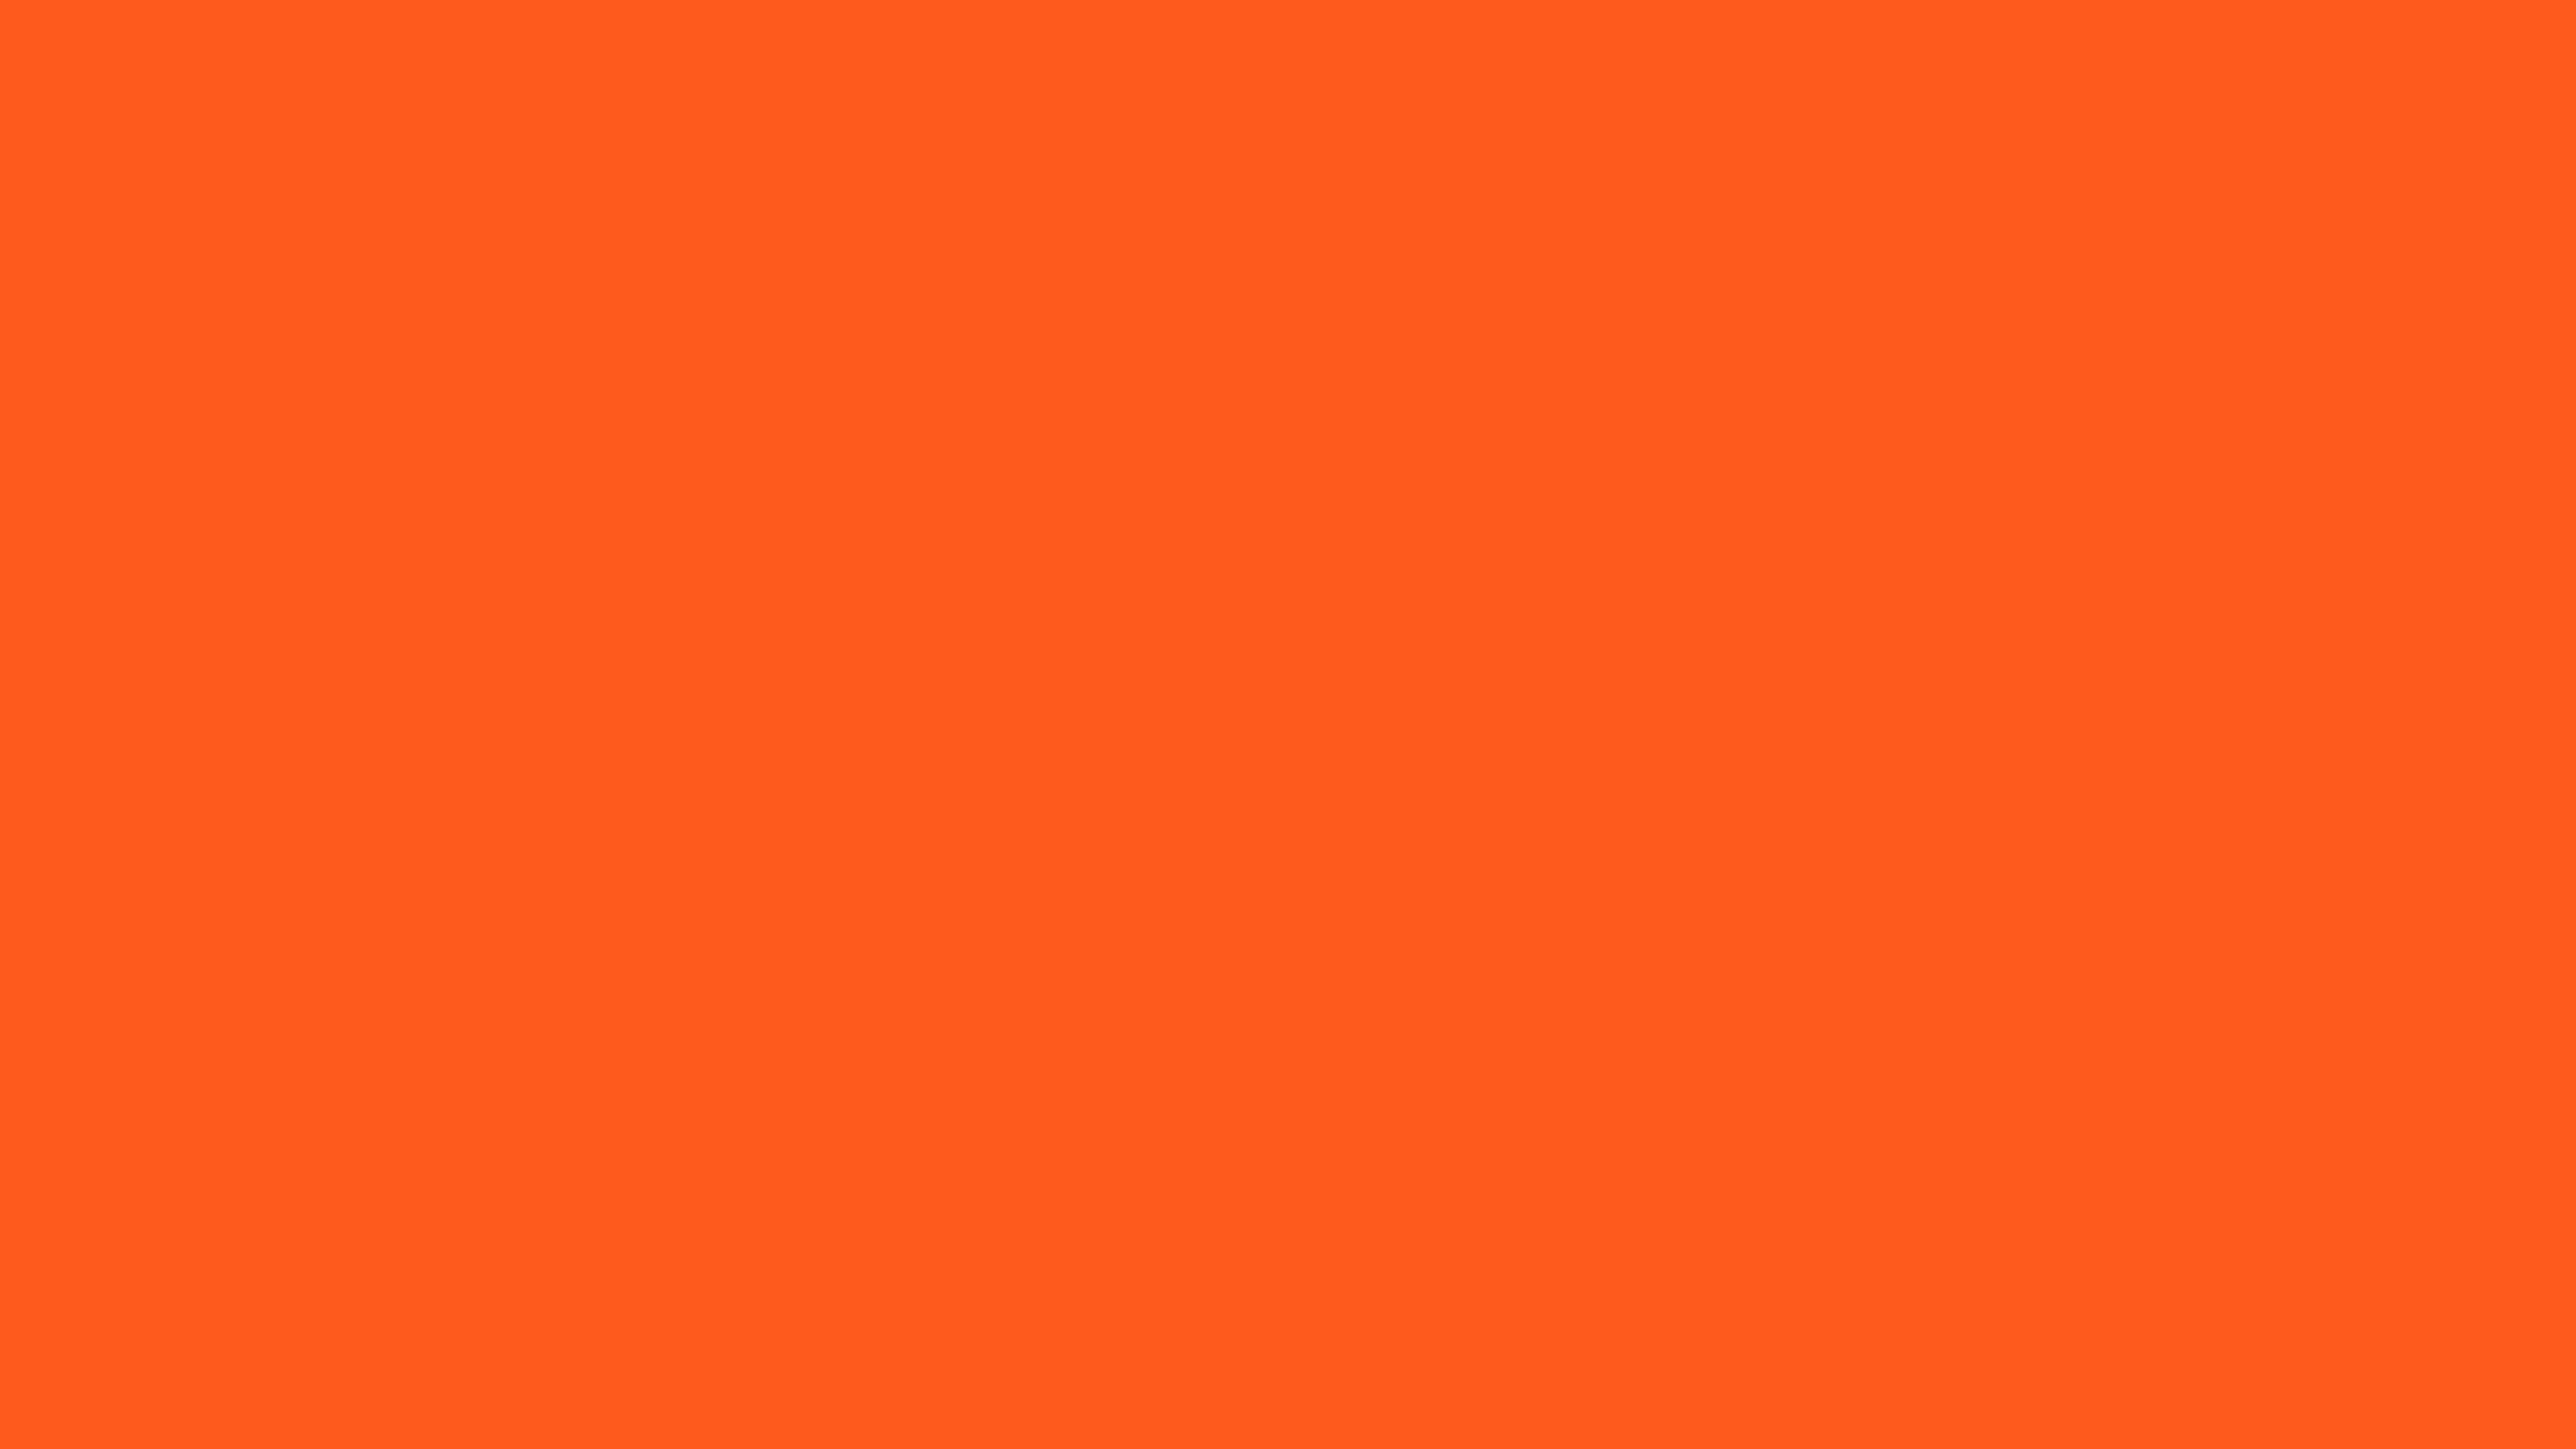 5120x2880 Giants Orange Solid Color Background